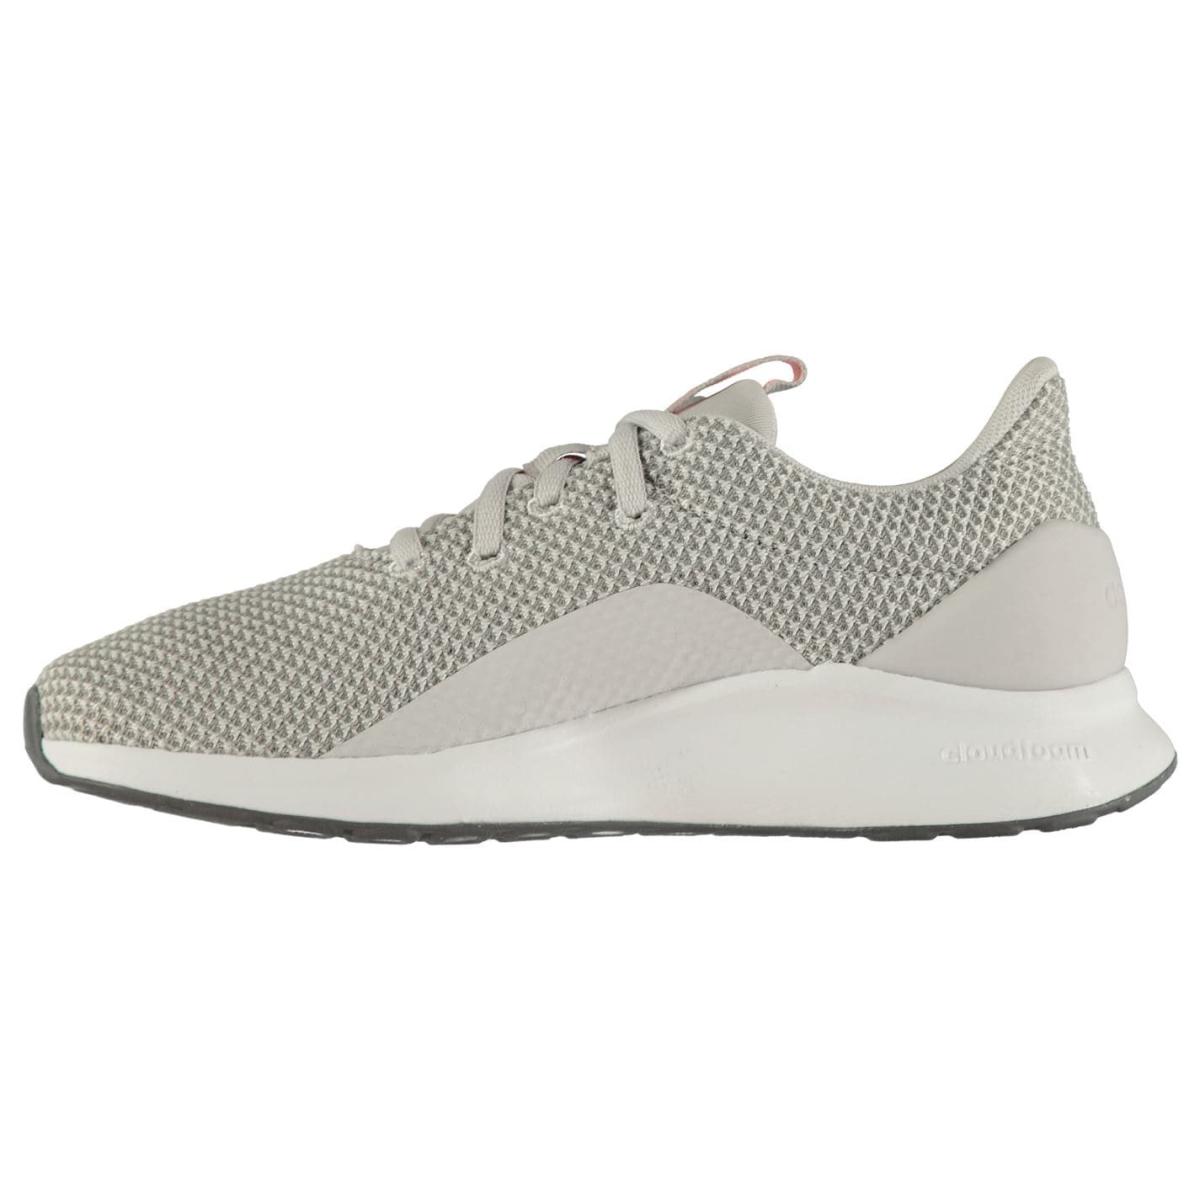 adidas-Puremotion-Turnschuhe-Damen-Sneaker-Sportschuhe-Laufschuhe-1562 Indexbild 8